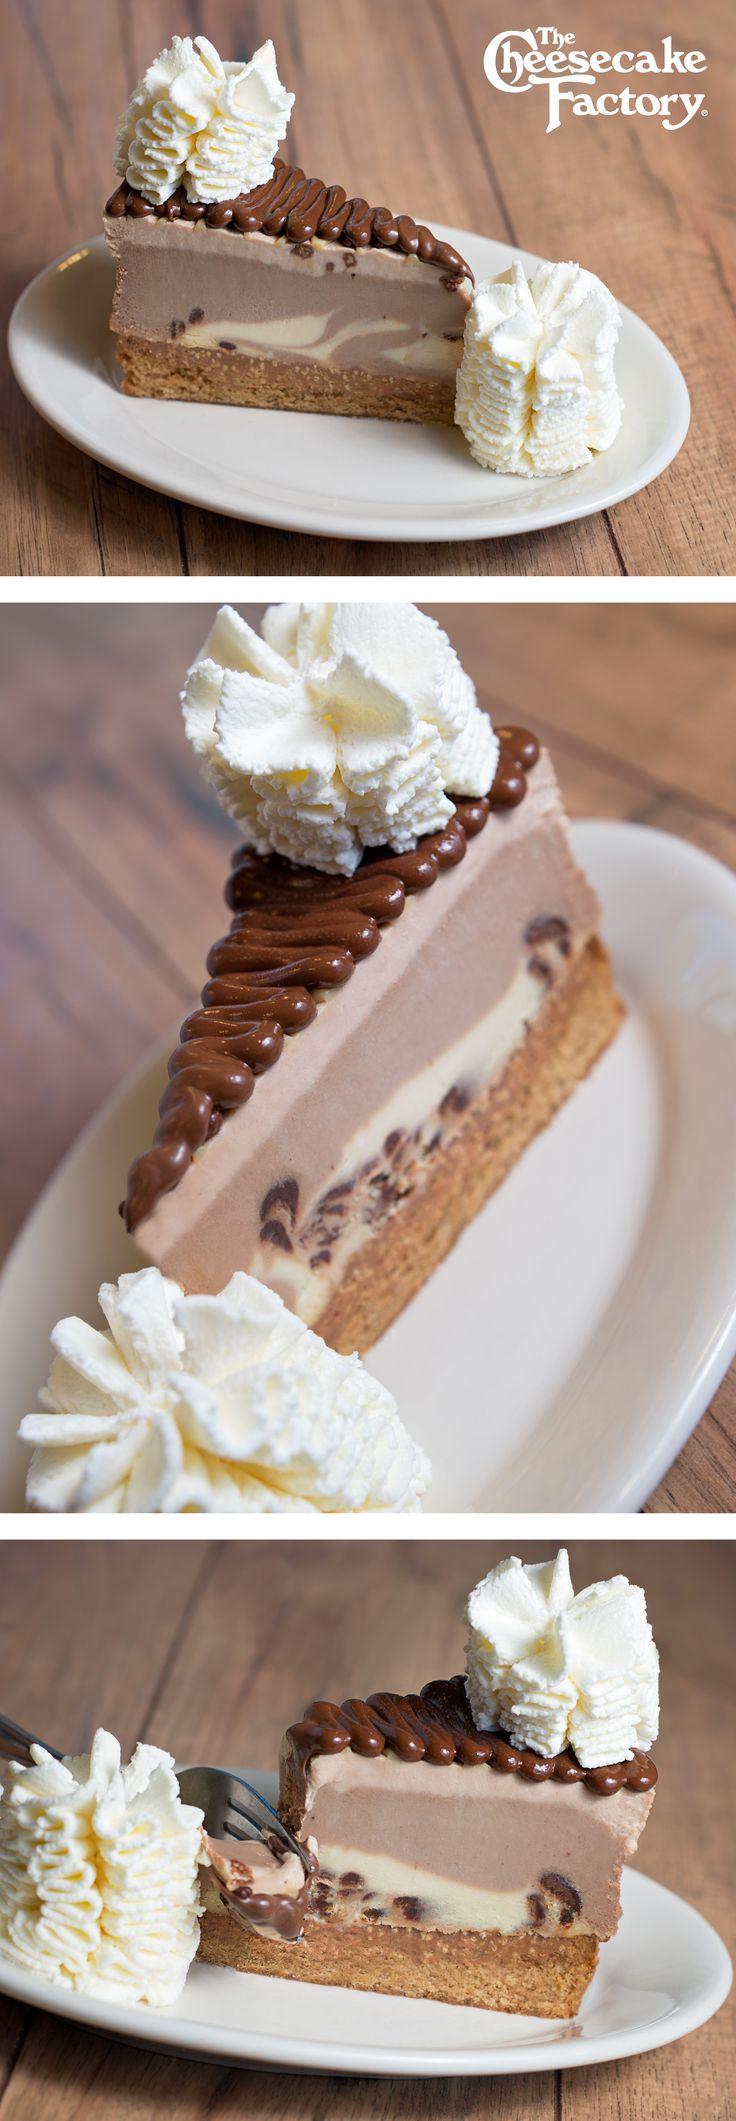 Chocolate Hazelnut Cheesecake Topped with Hazelnut Crunch and Nutella®